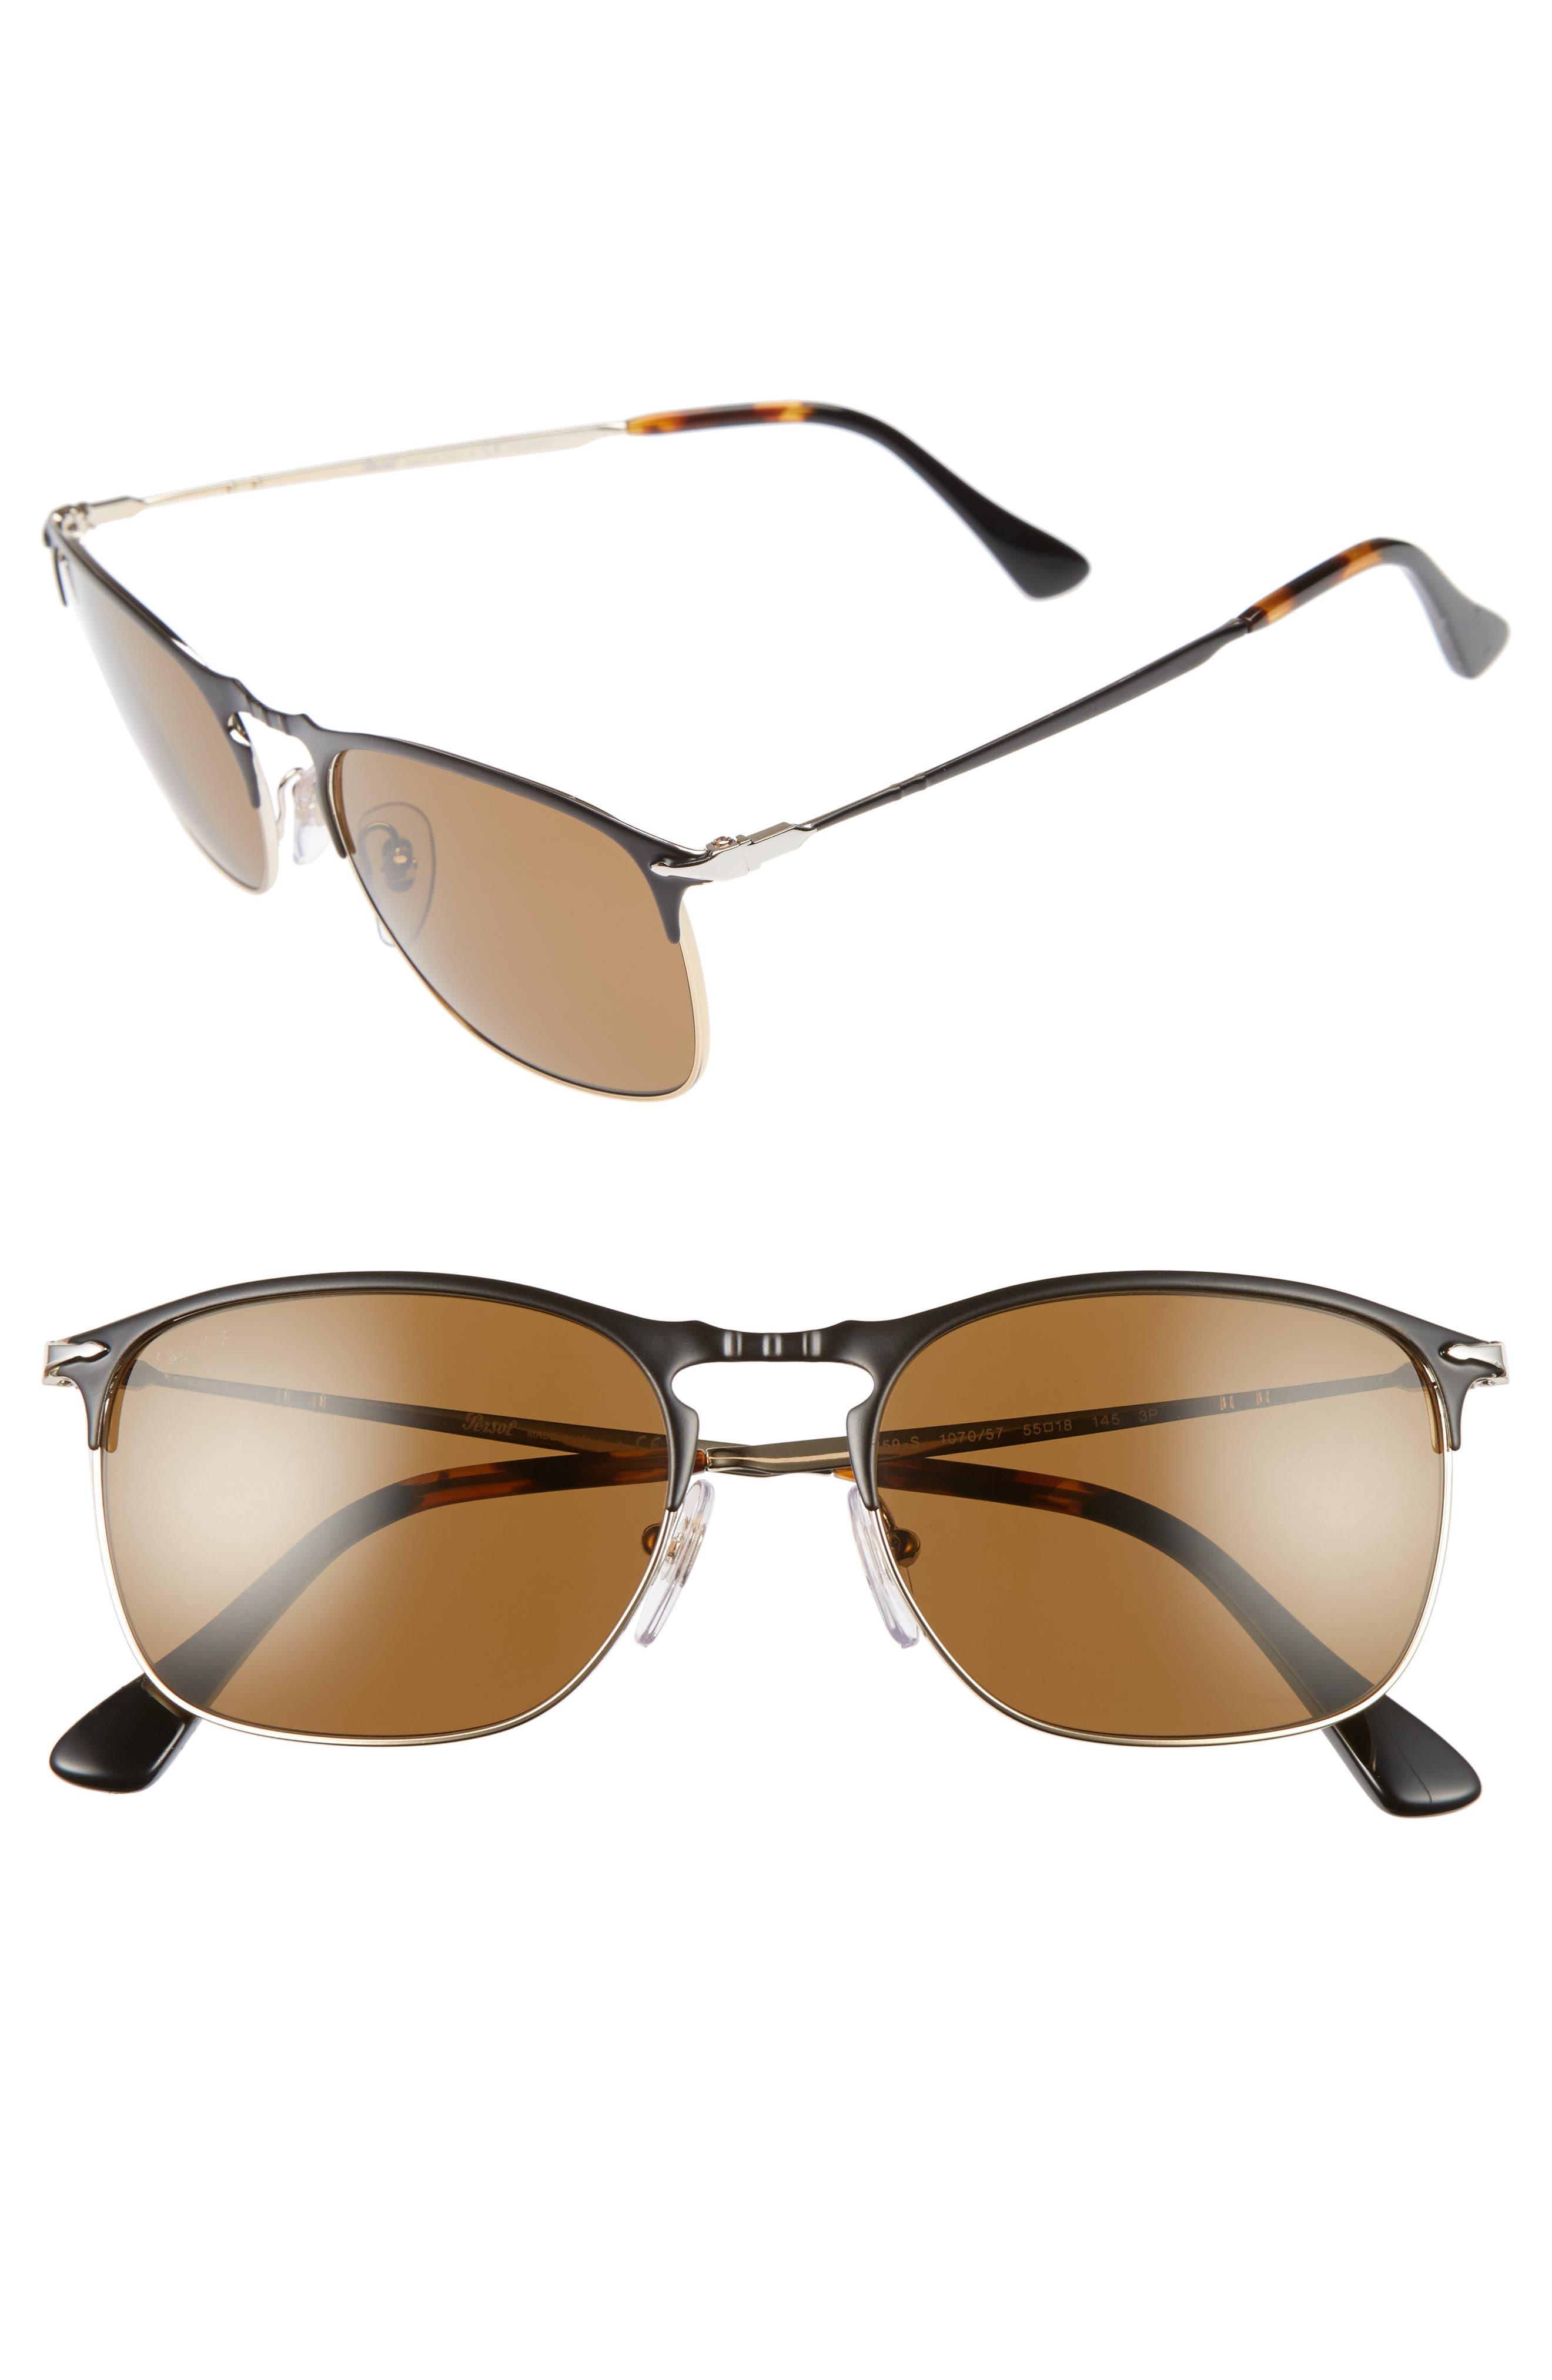 Evolution 55mm Polarized Aviator Sunglasses,                         Main,                         color, Matte Black